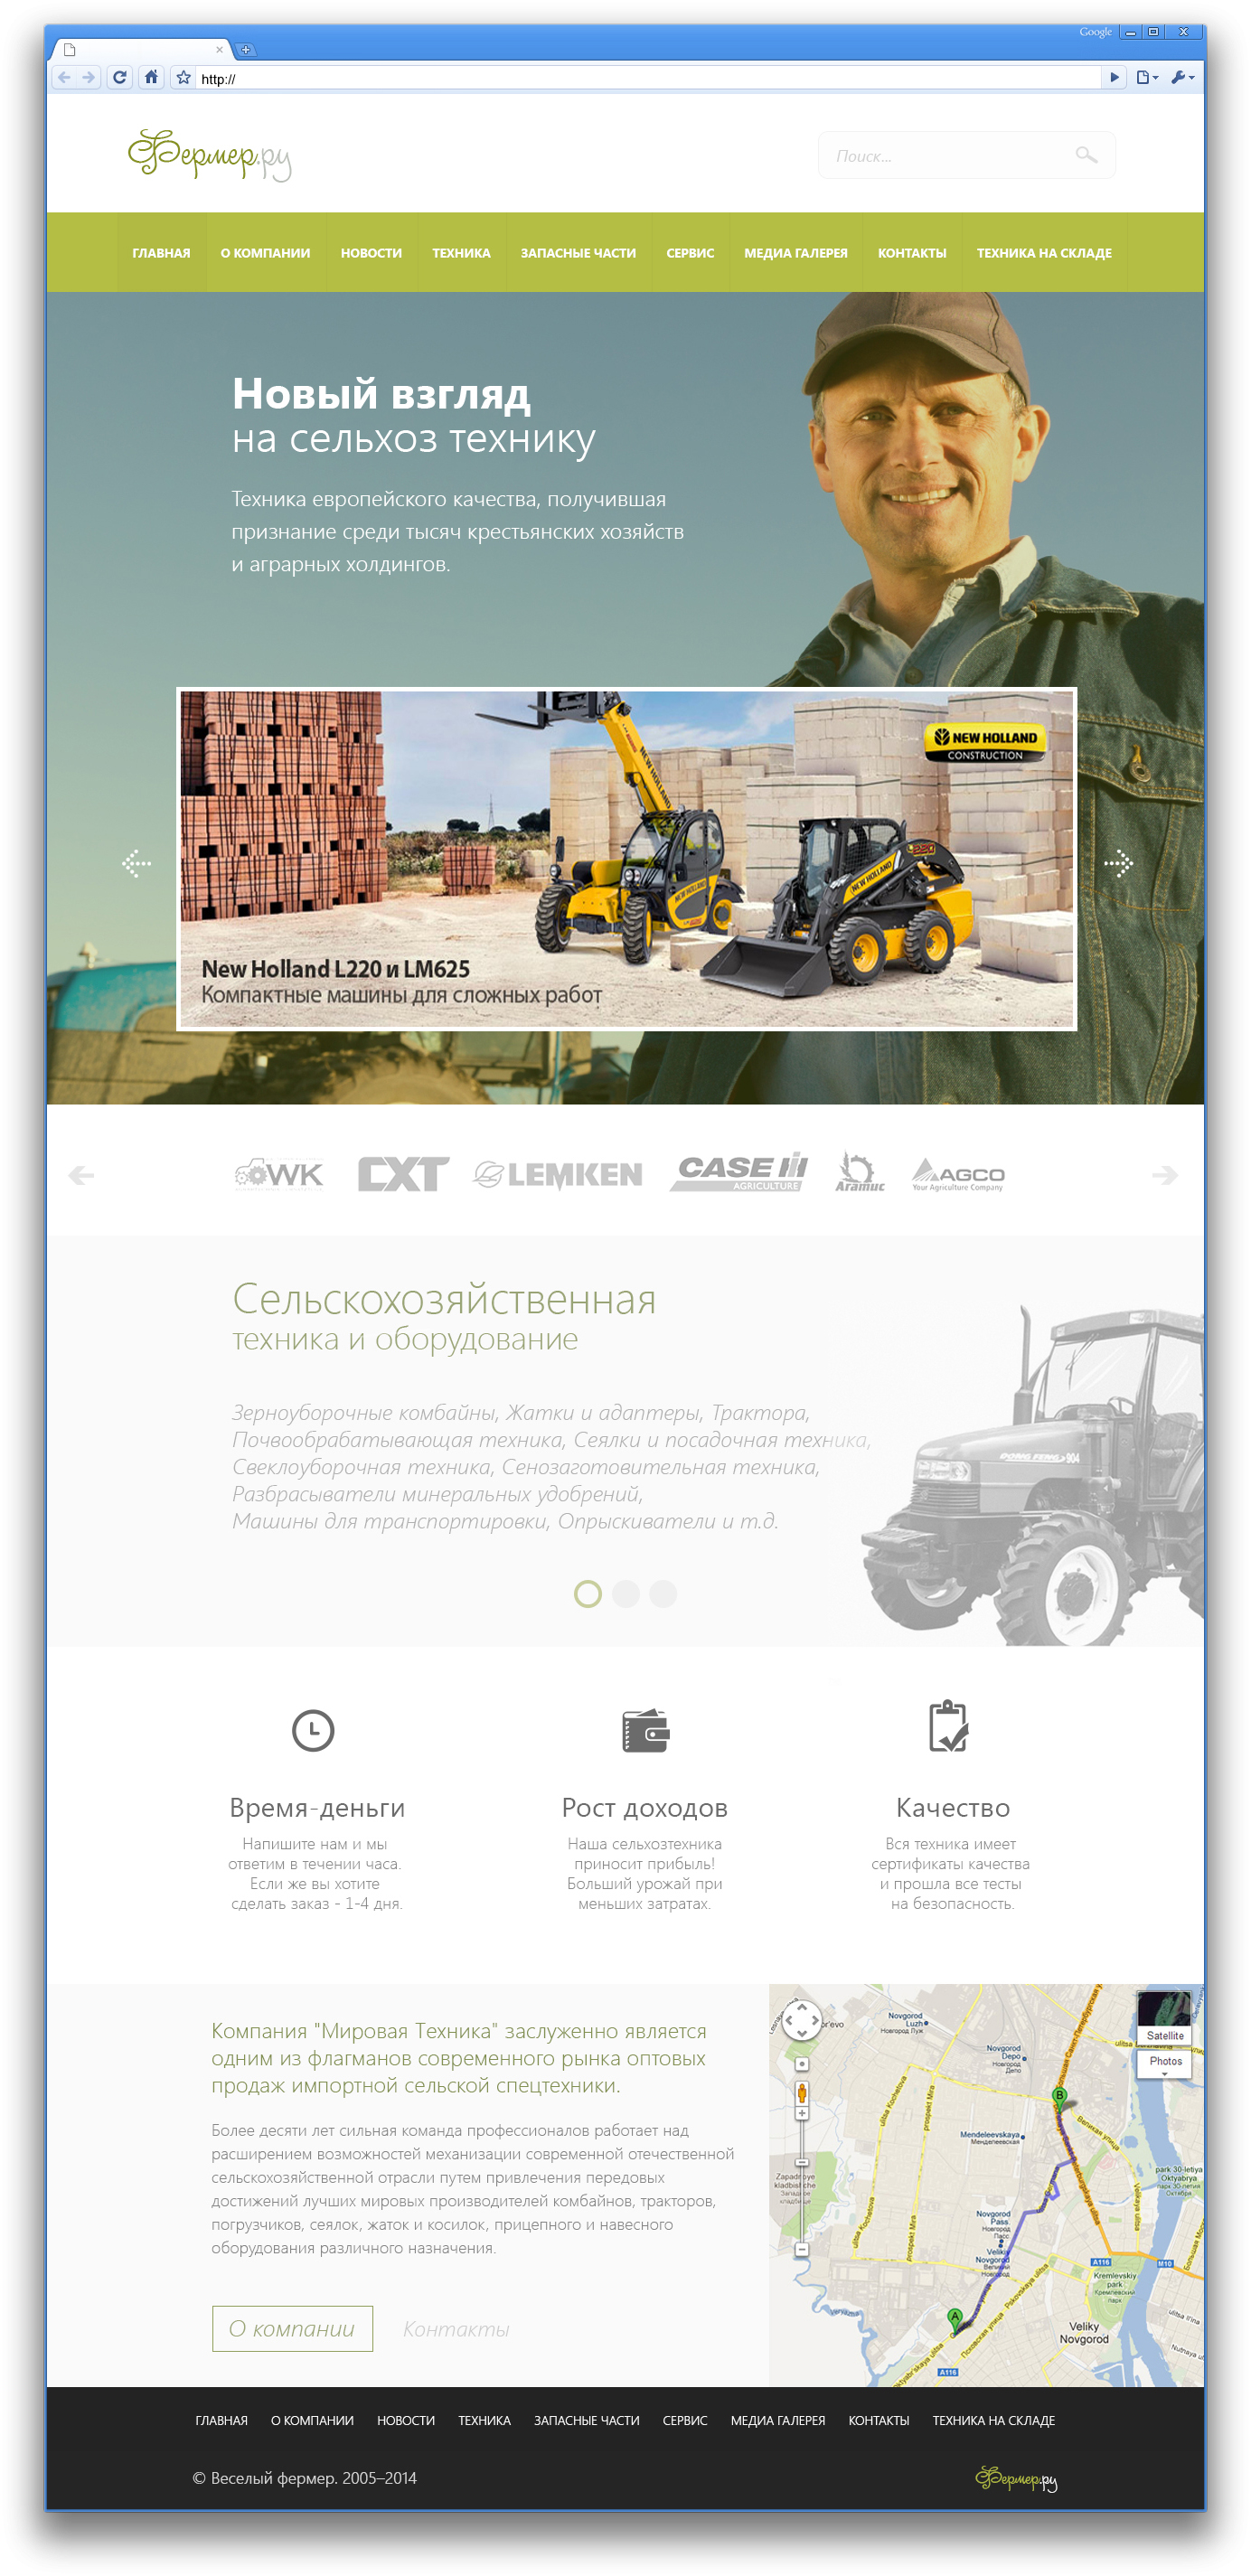 Дизайн сайта сельхоз техники фото f_06353a58db553f2c.jpg